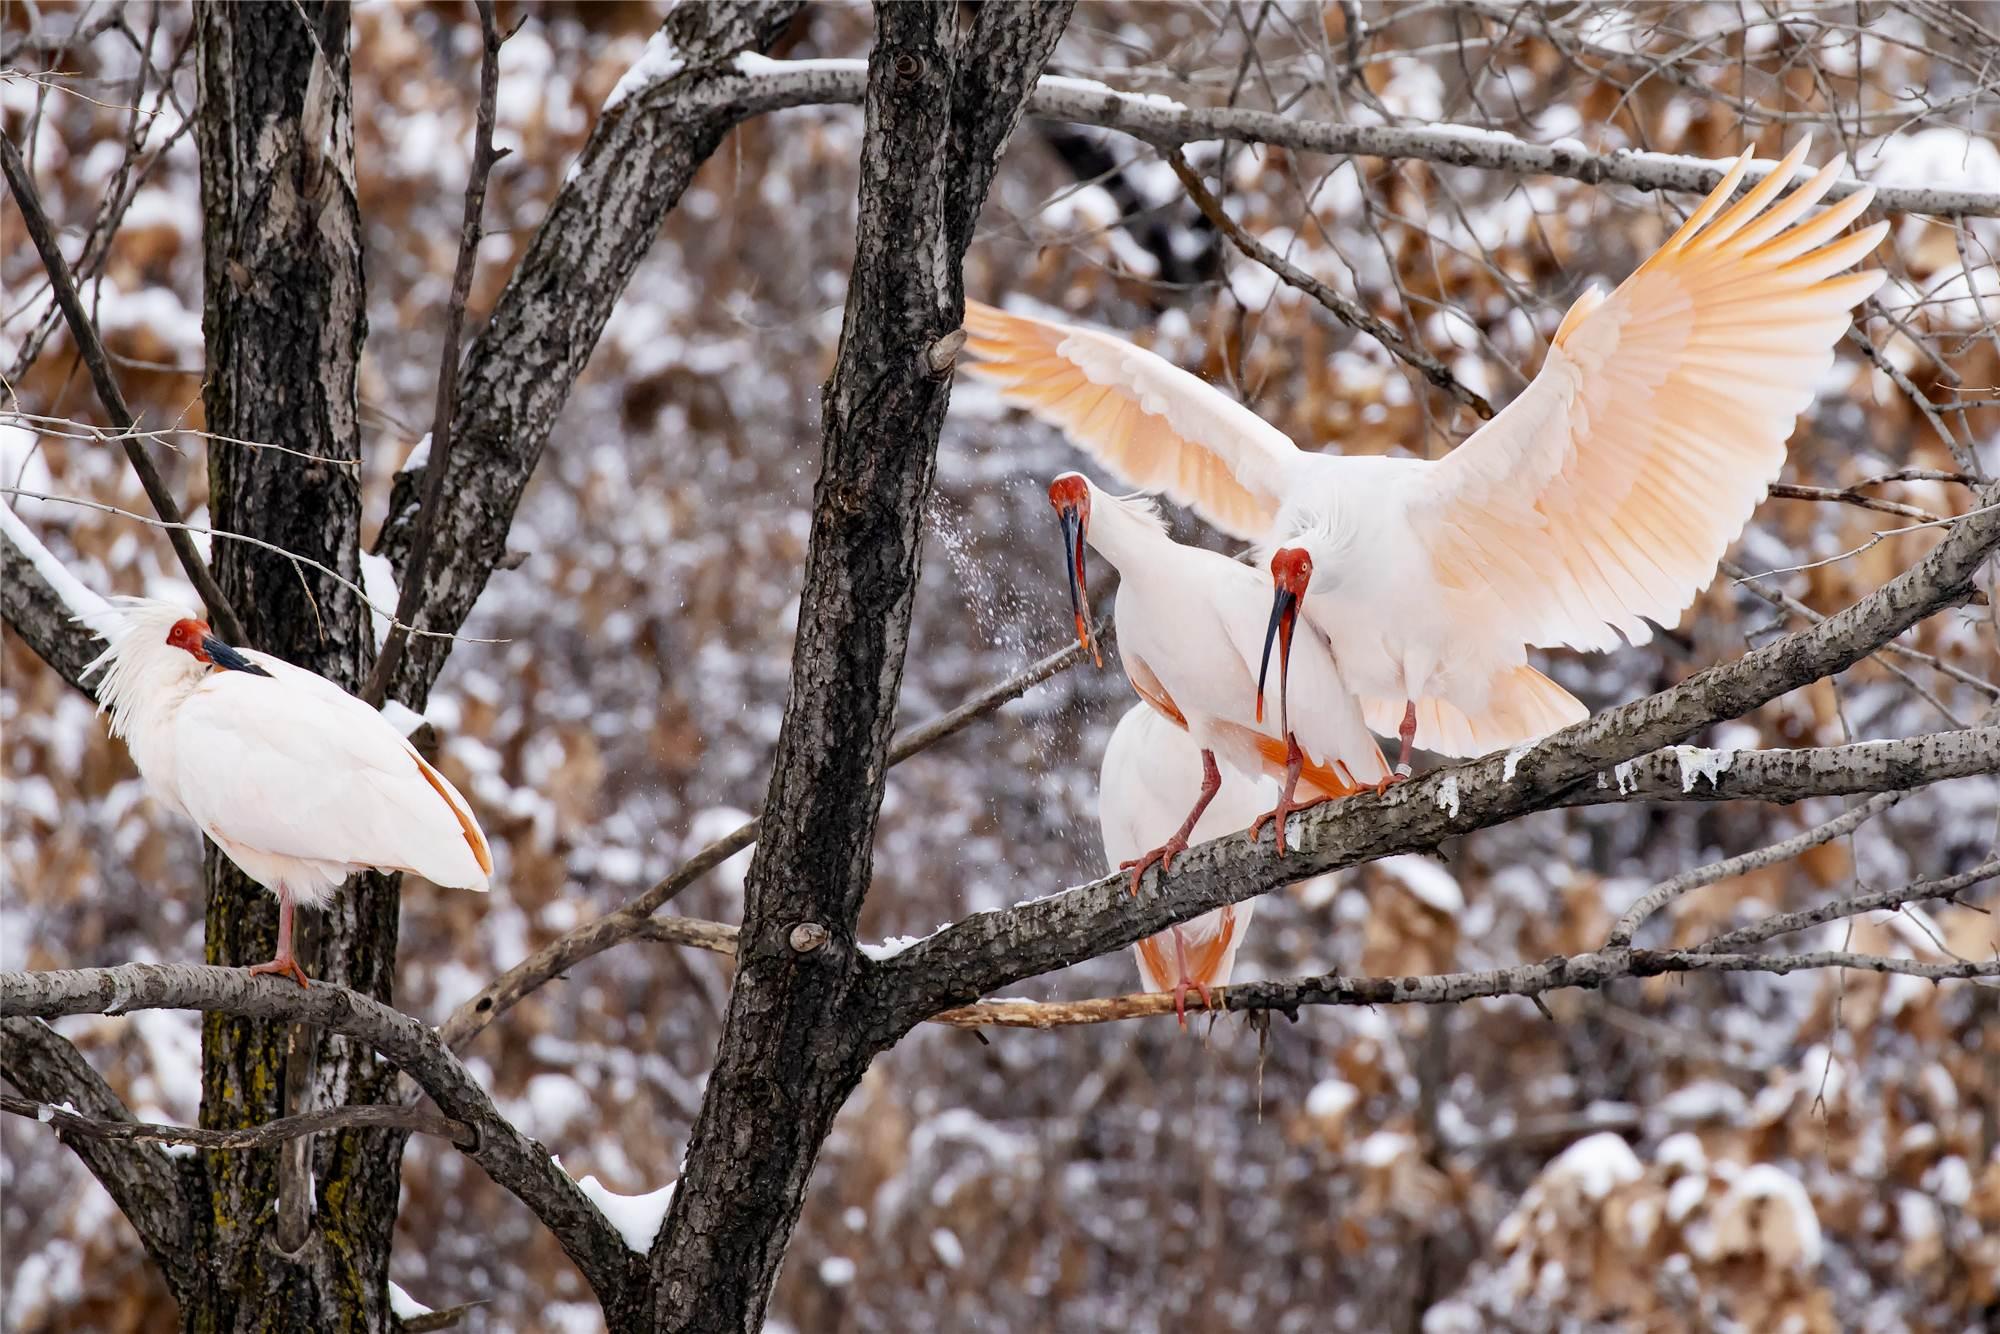 Rare birds enjoy first snowfall of 2020 in NW China